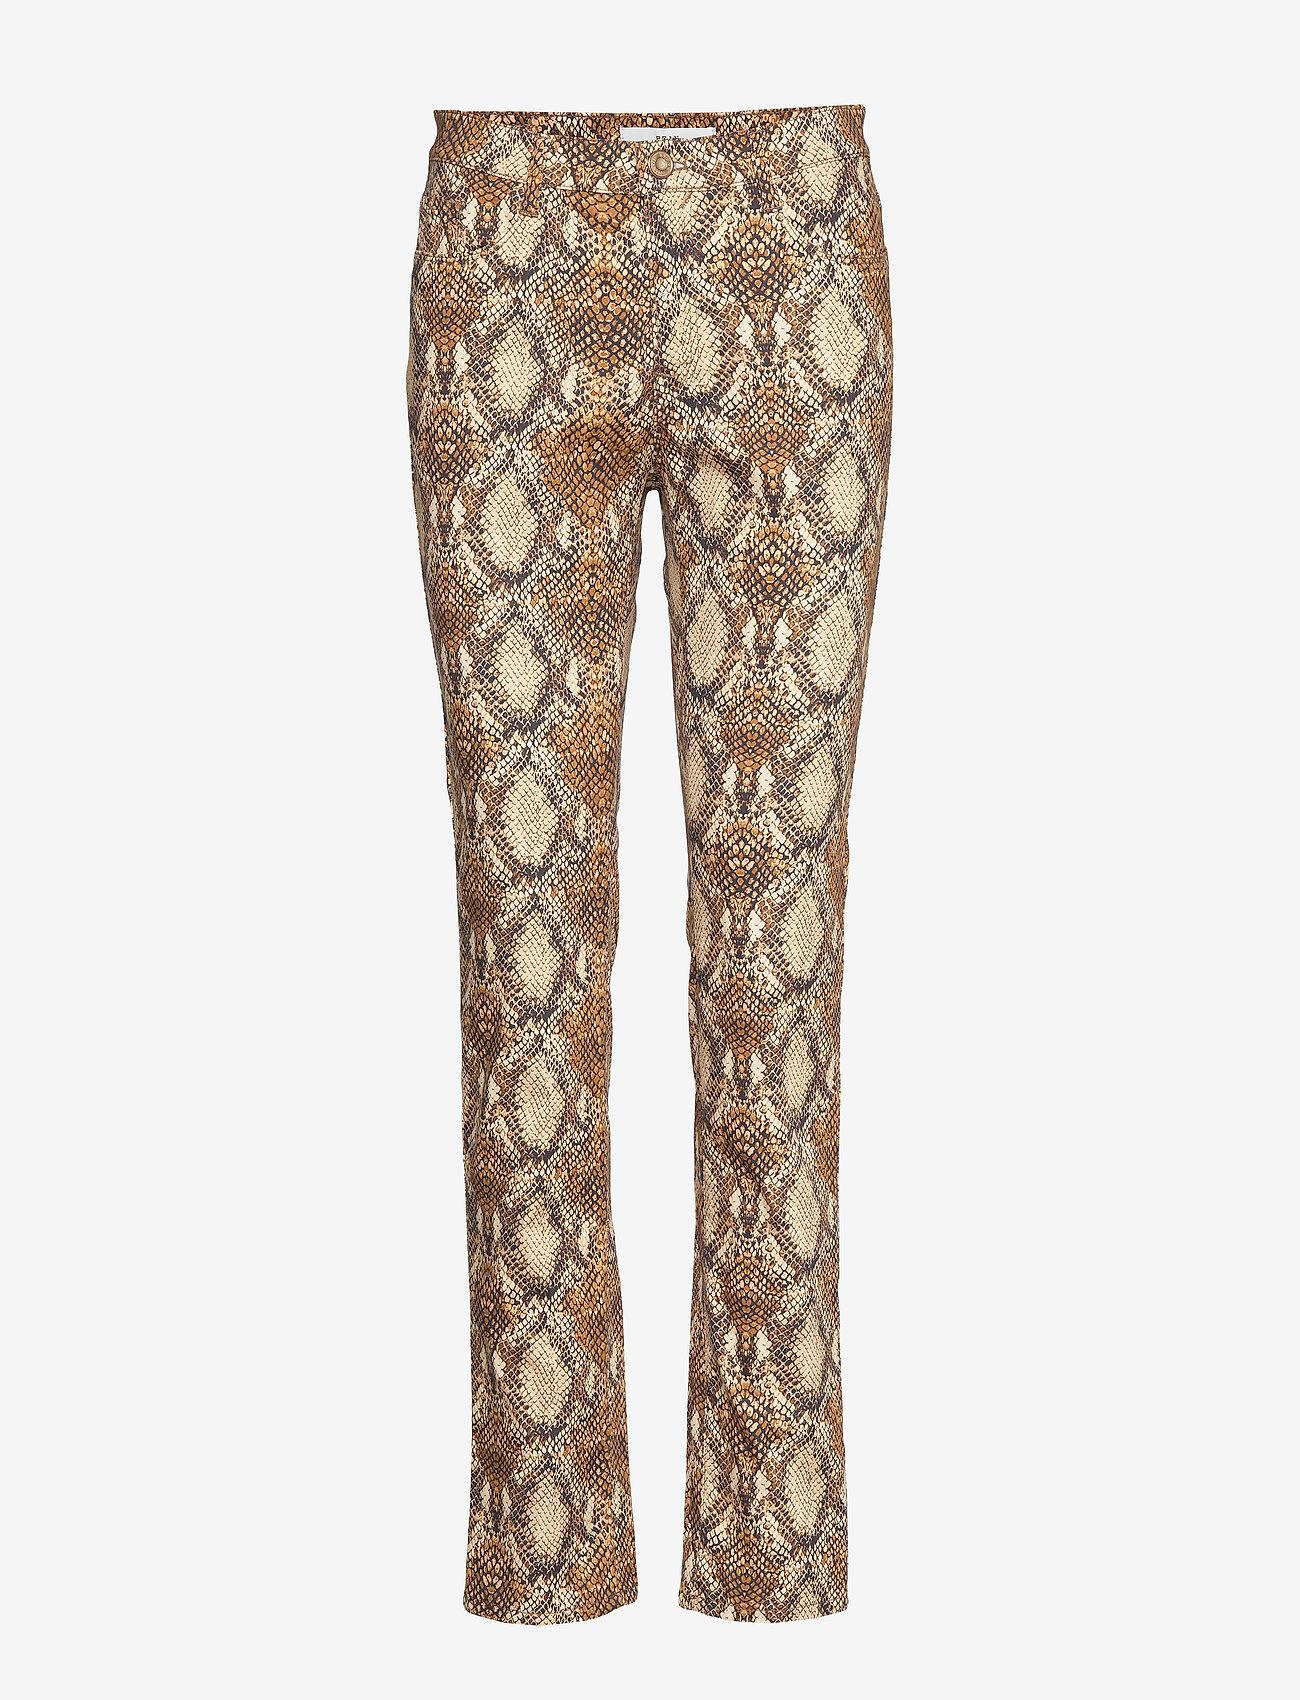 BRAX - MARY - slim fit trousers - cognac - 0